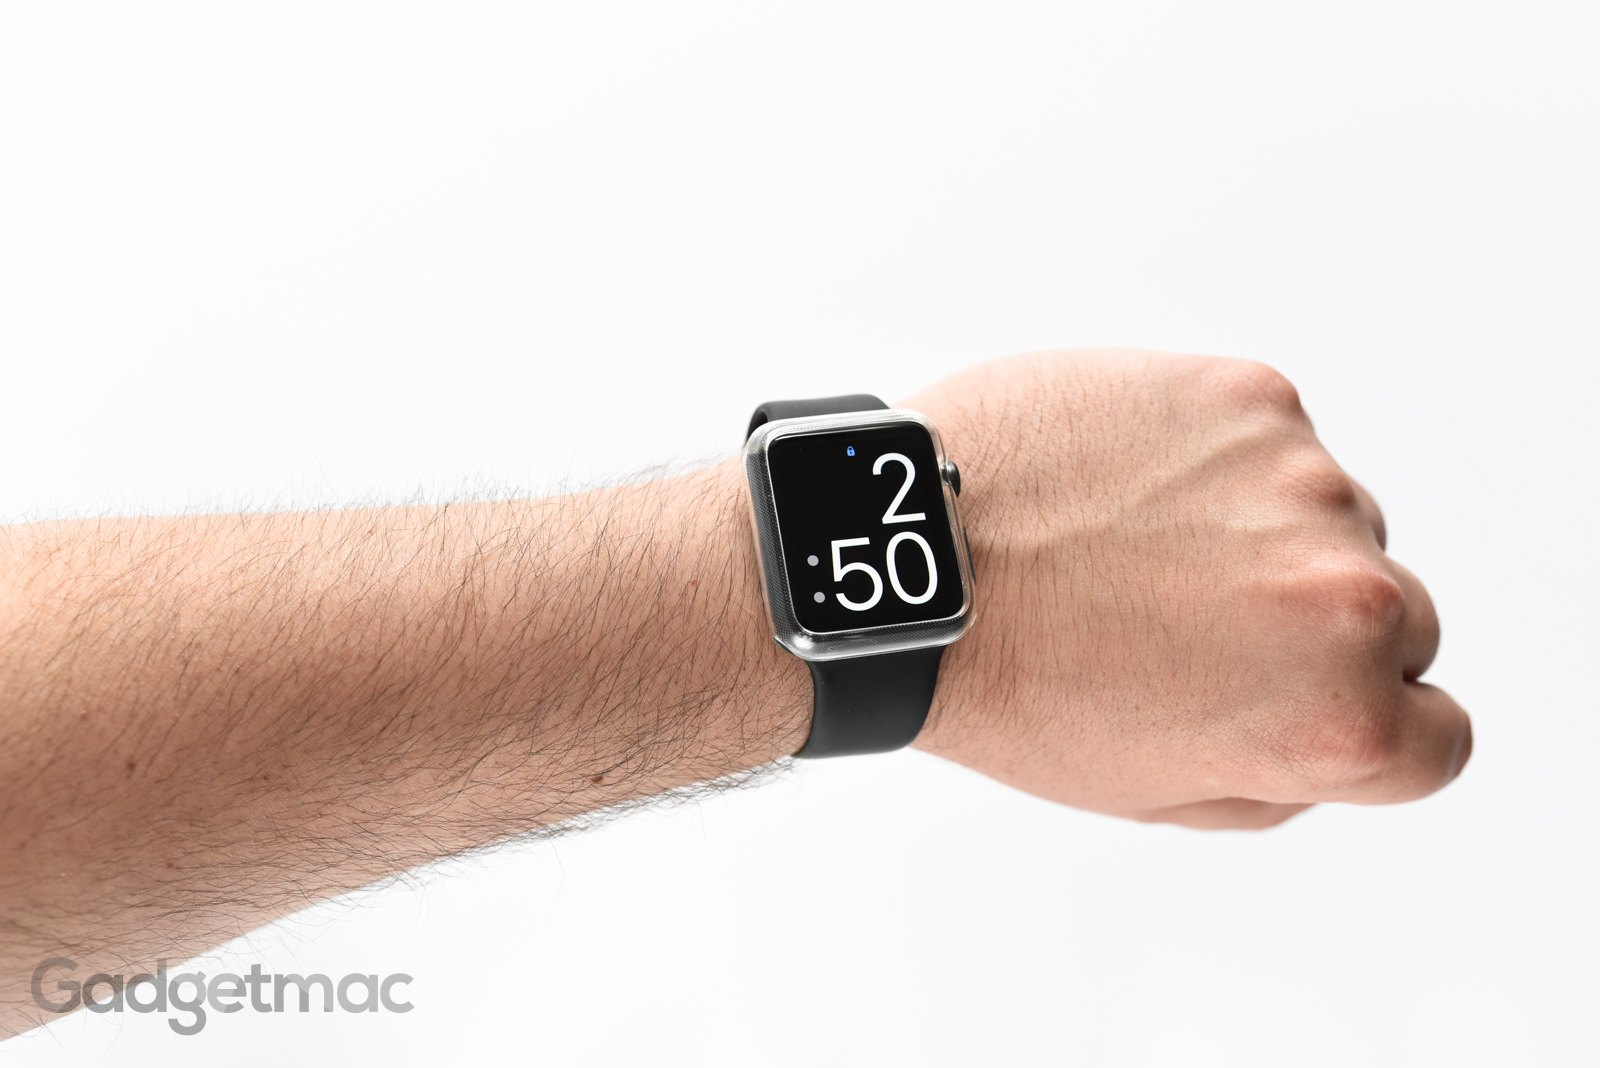 spigen-liquid-crystal-case-for-apple-watch.jpg